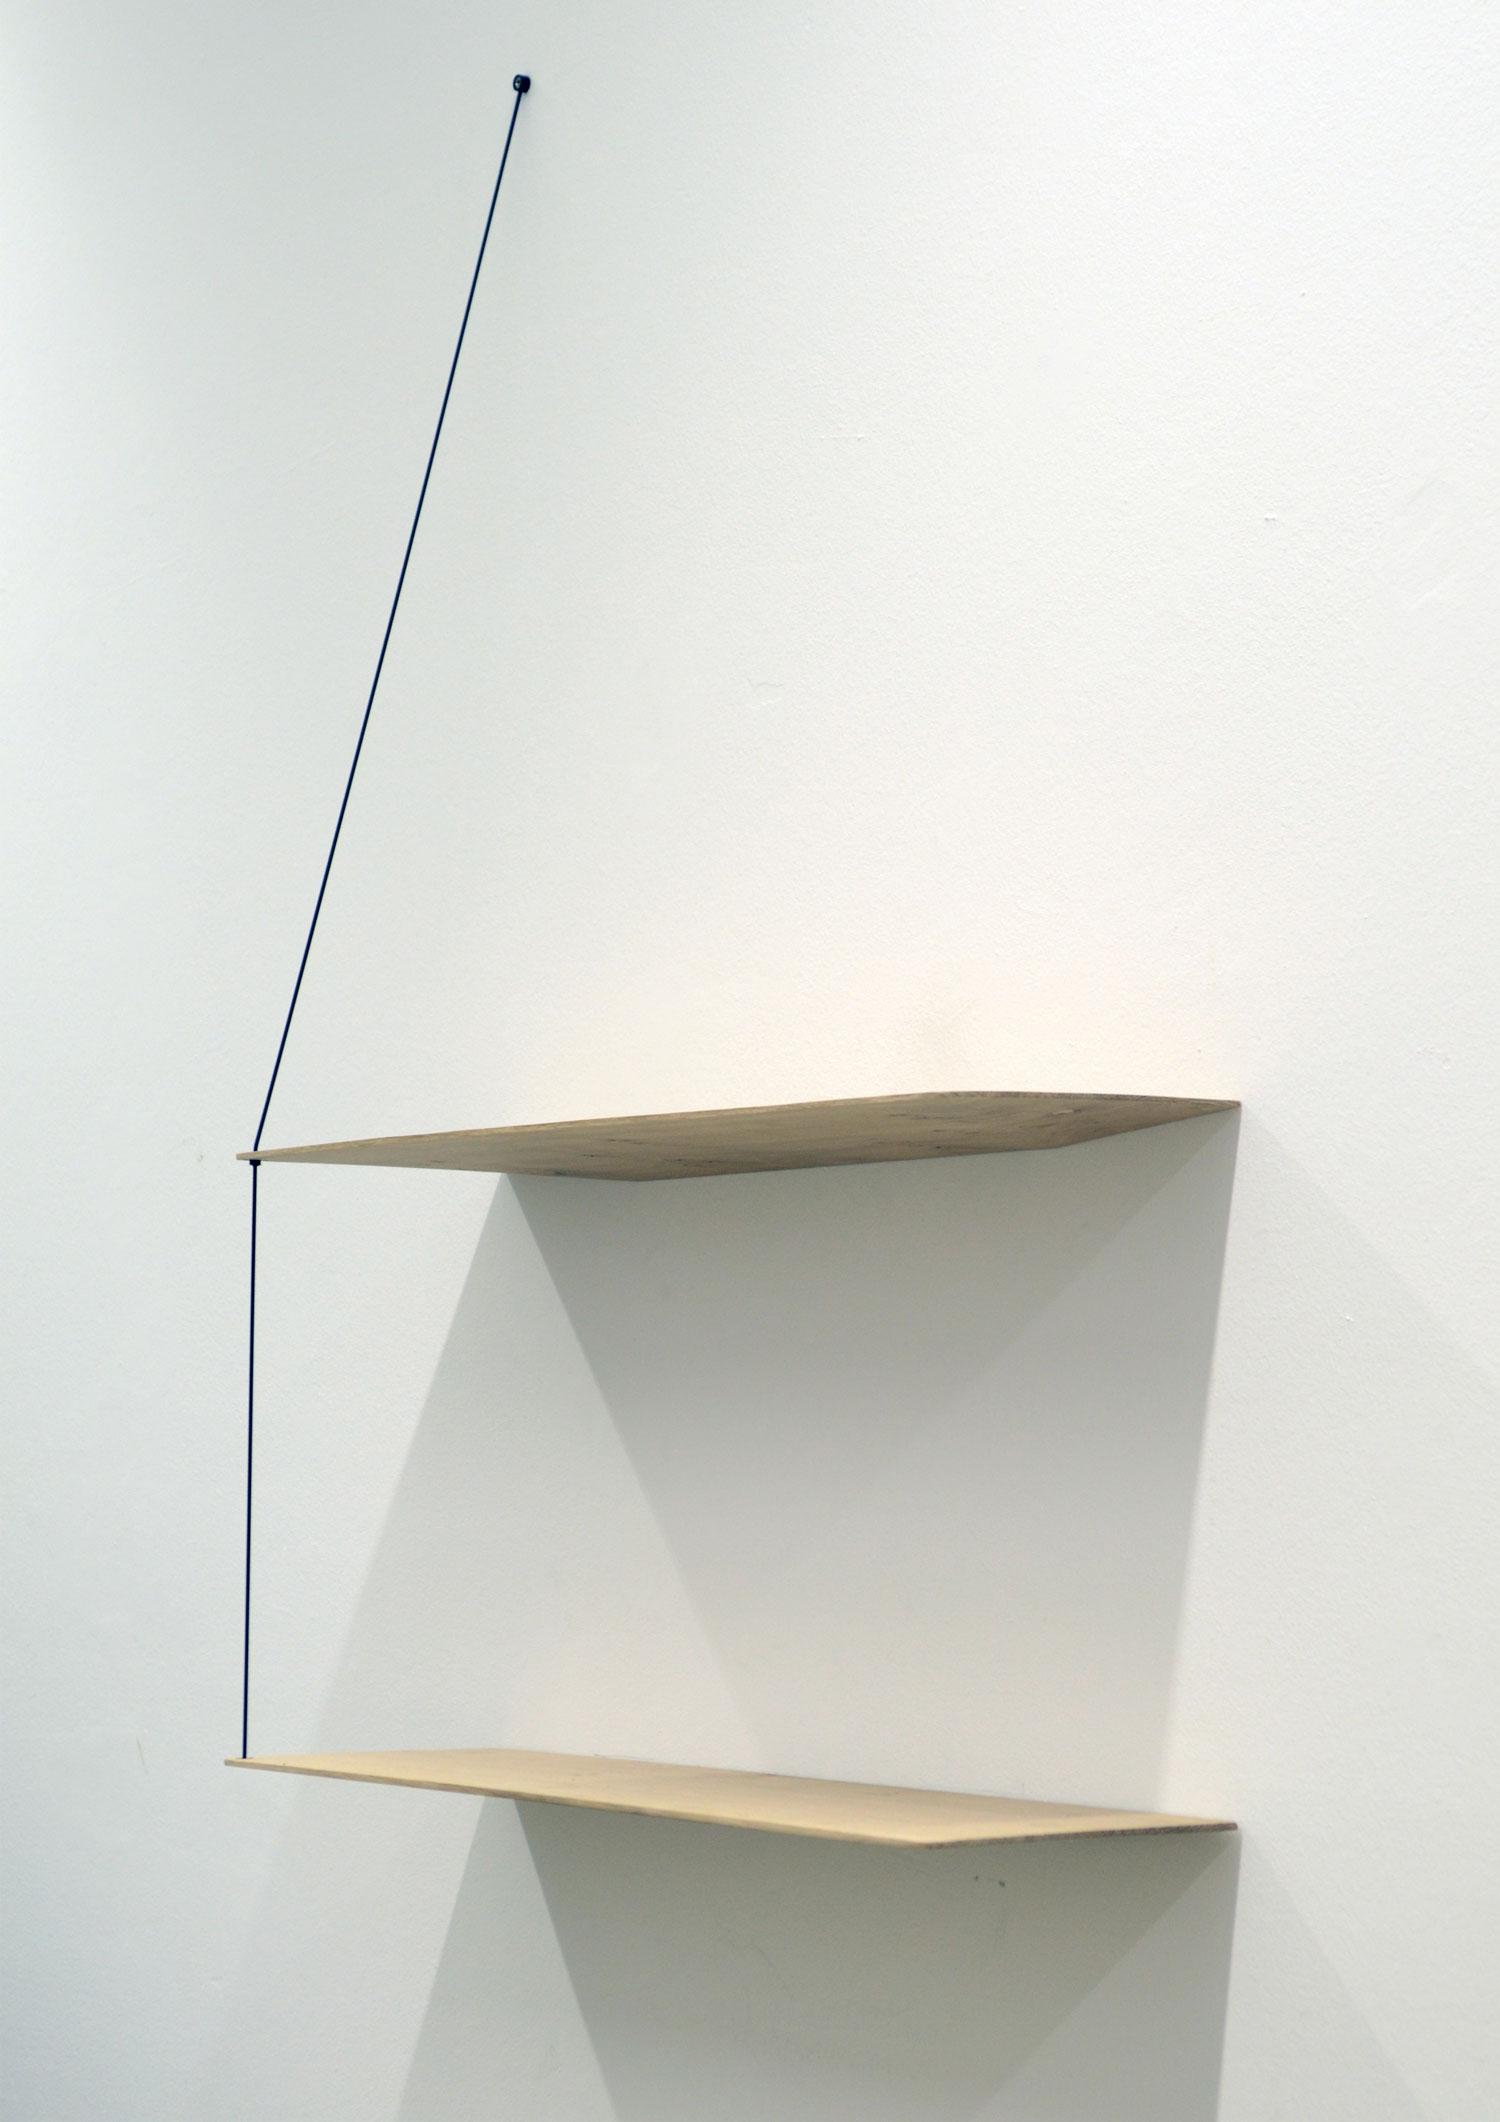 Stab im Brett by Leonard Aldenhoff | Yellowtrace